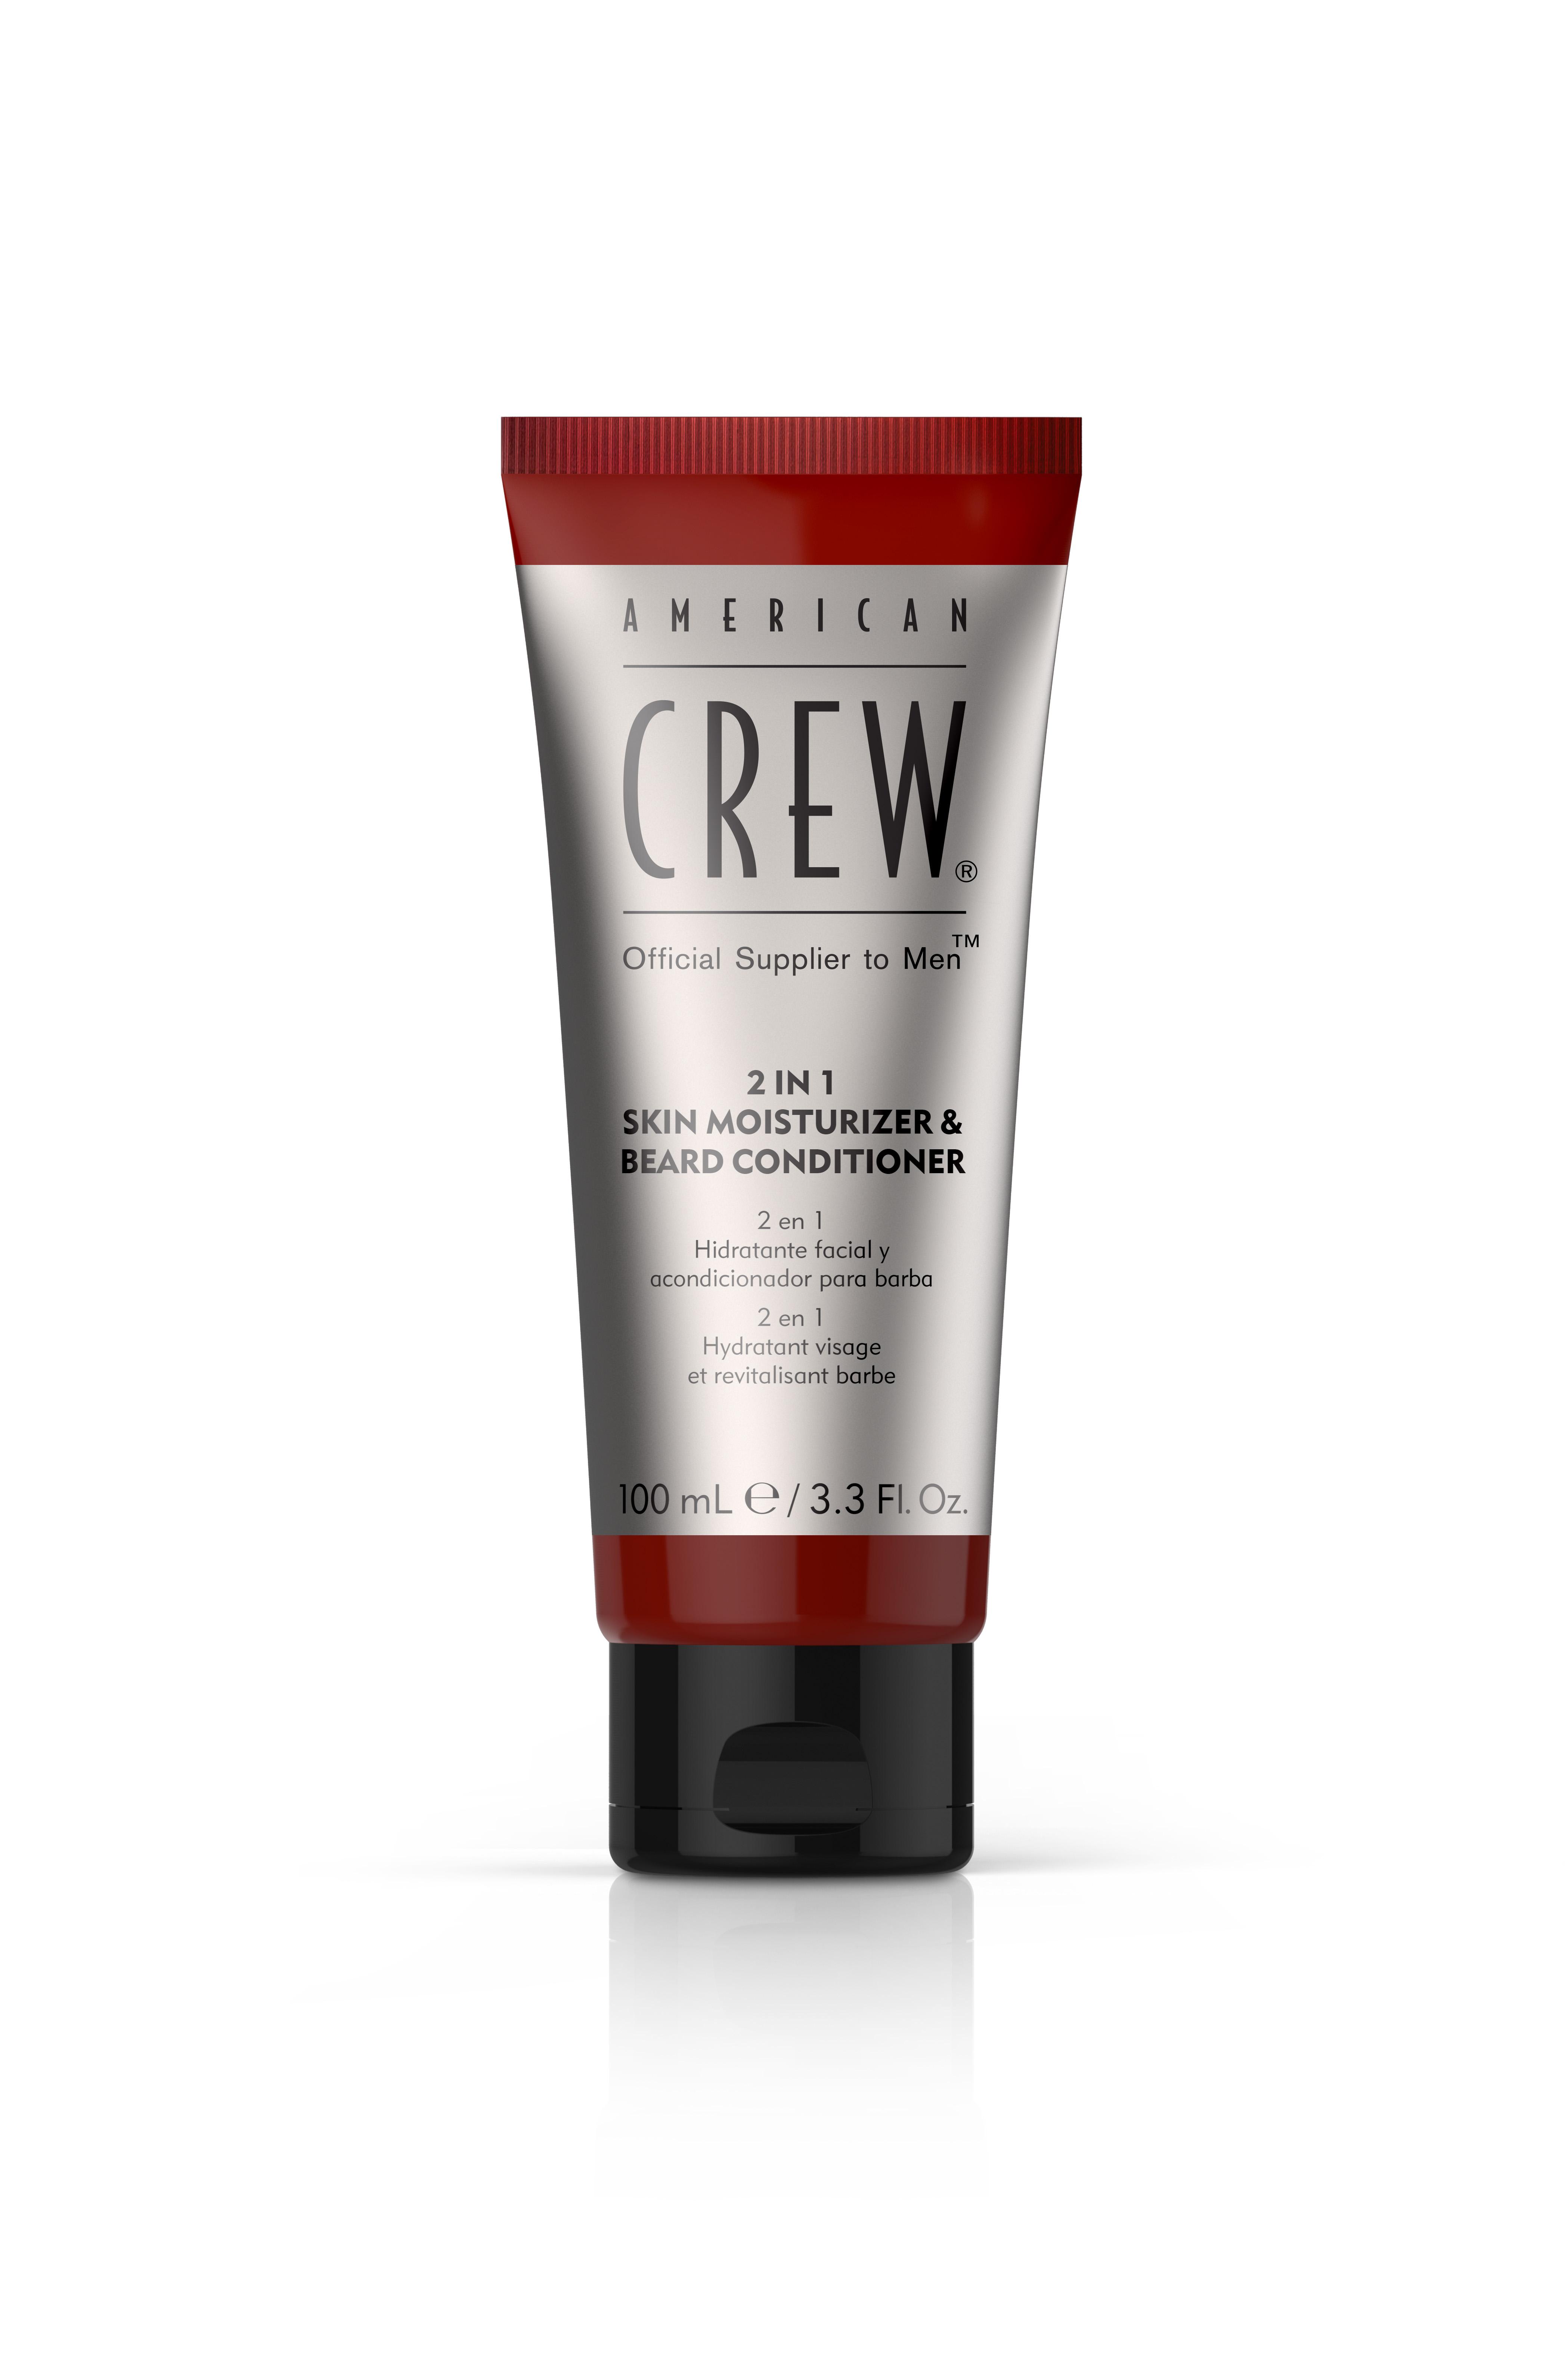 American Crew Grows Beard Line With Moisturizer and Wax